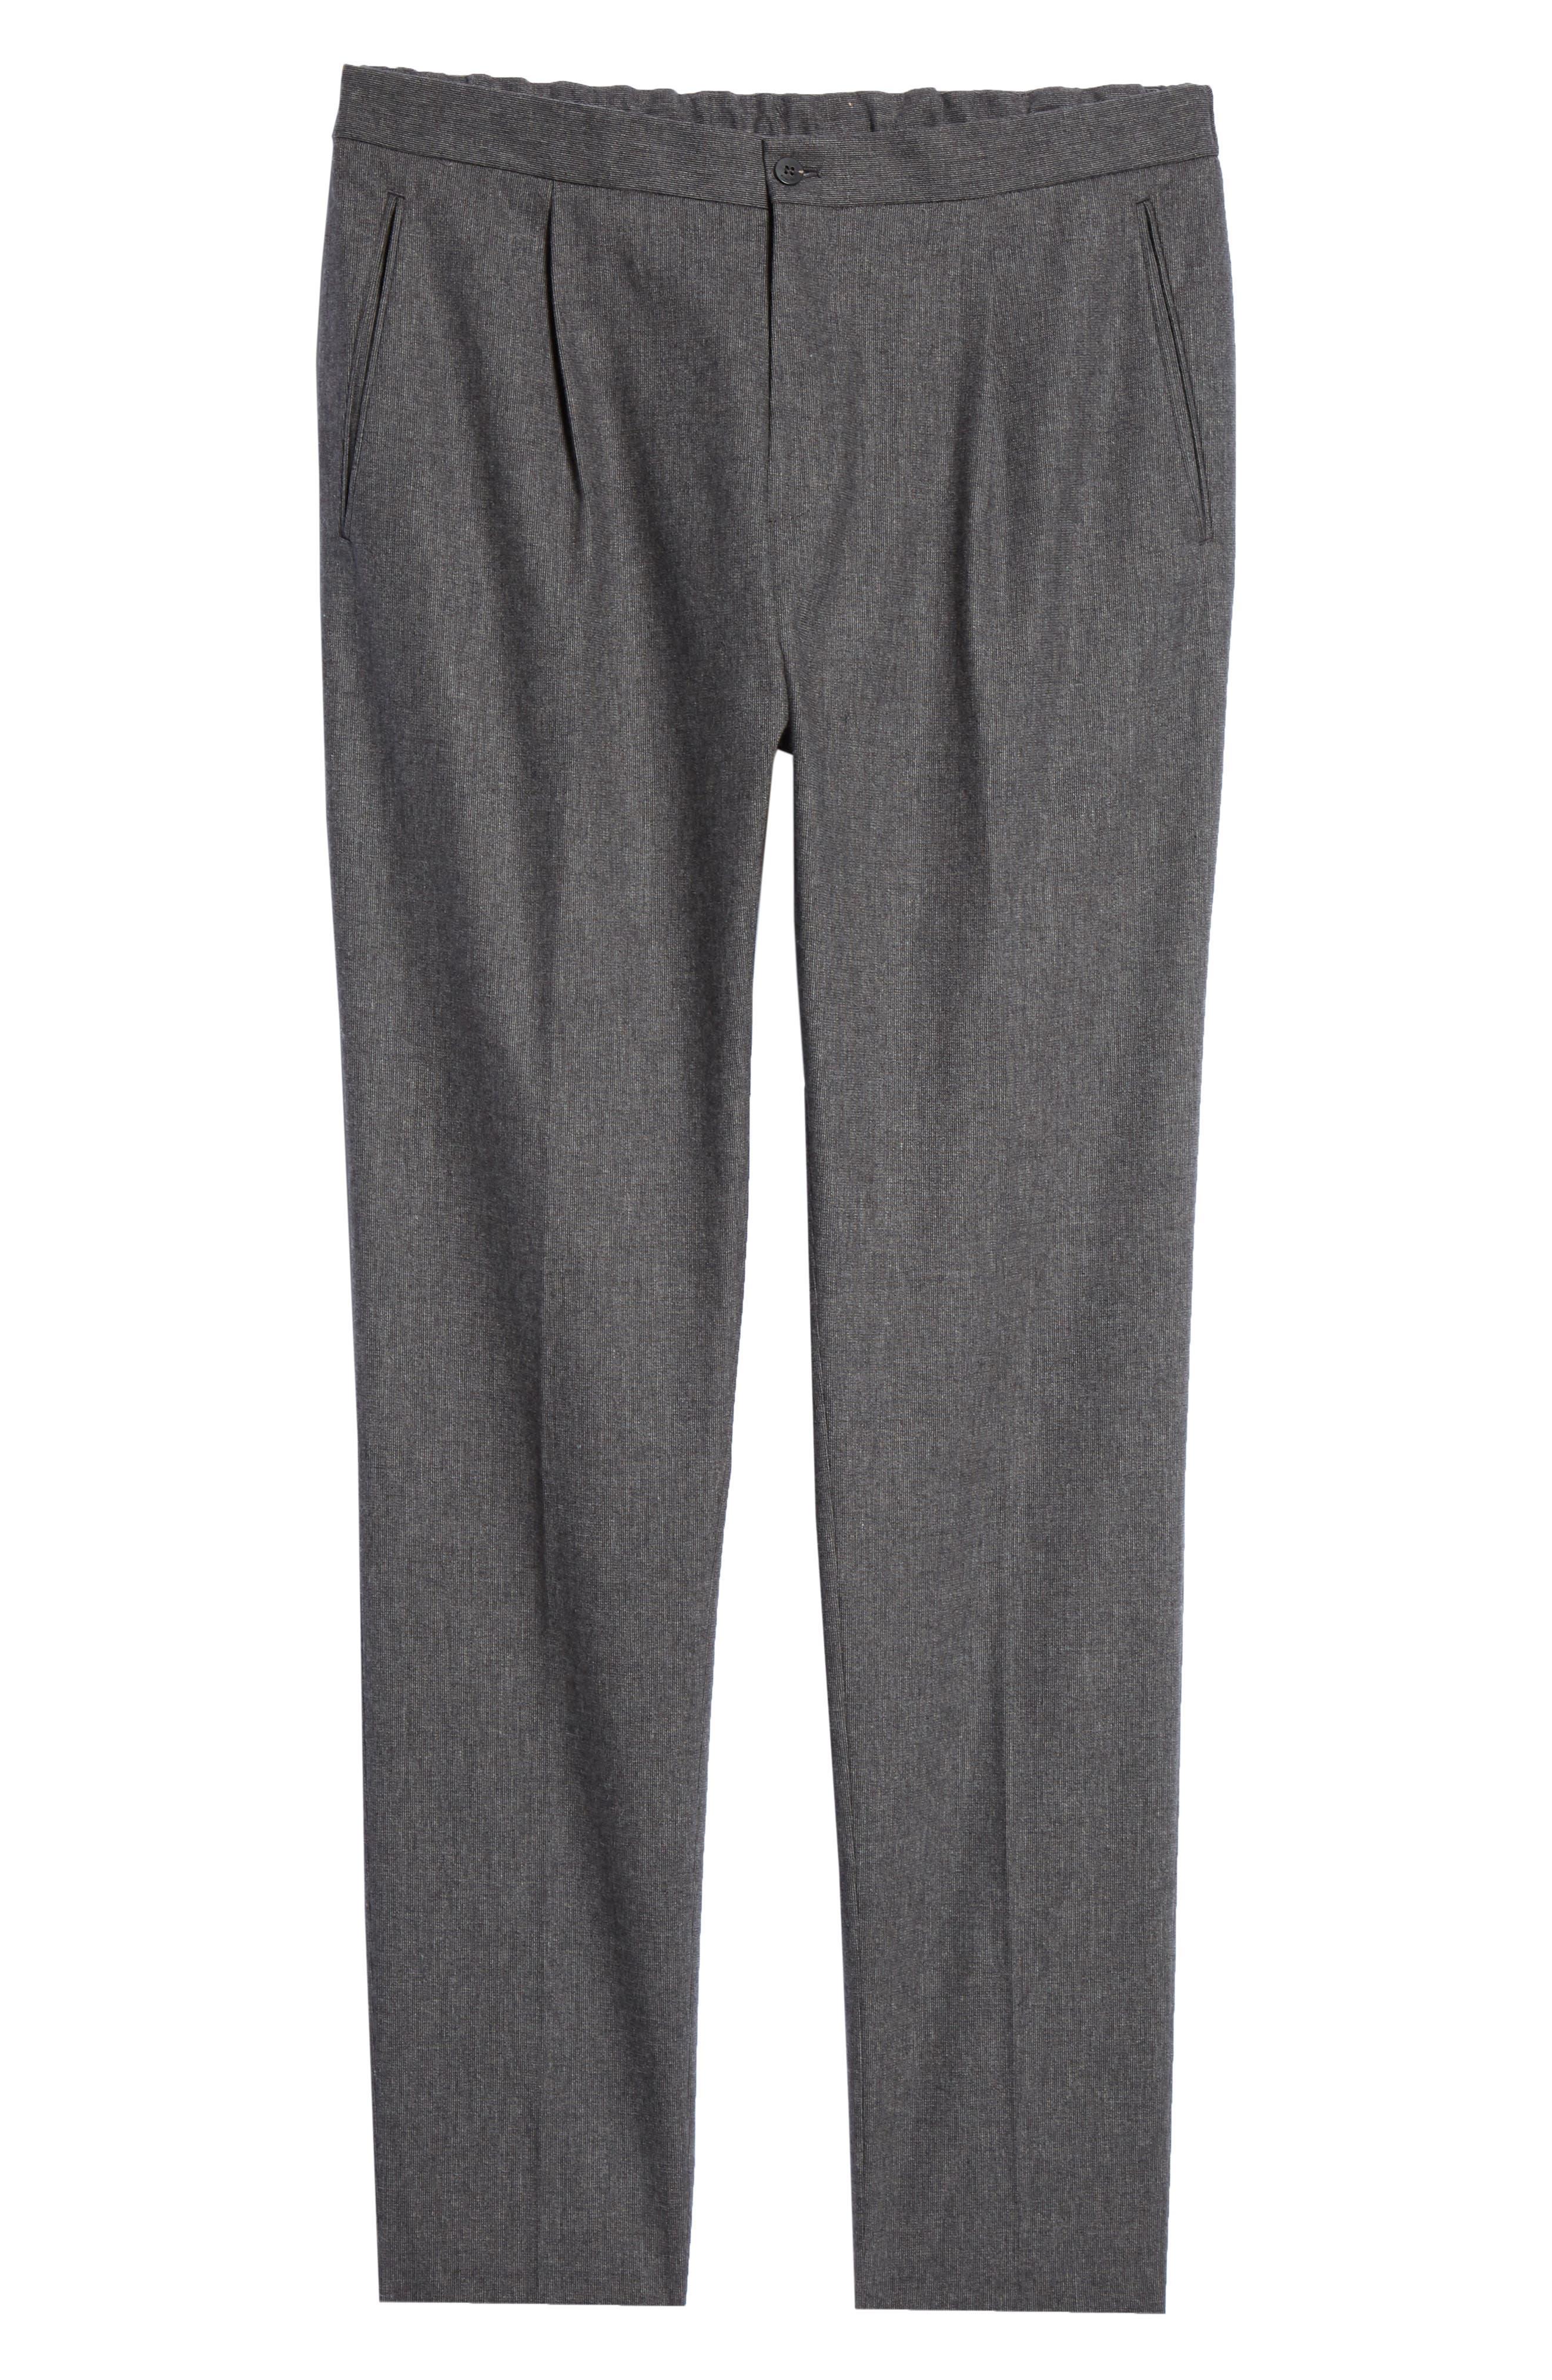 Trim Fit Sport Trousers,                             Alternate thumbnail 6, color,                             CHARCOAL